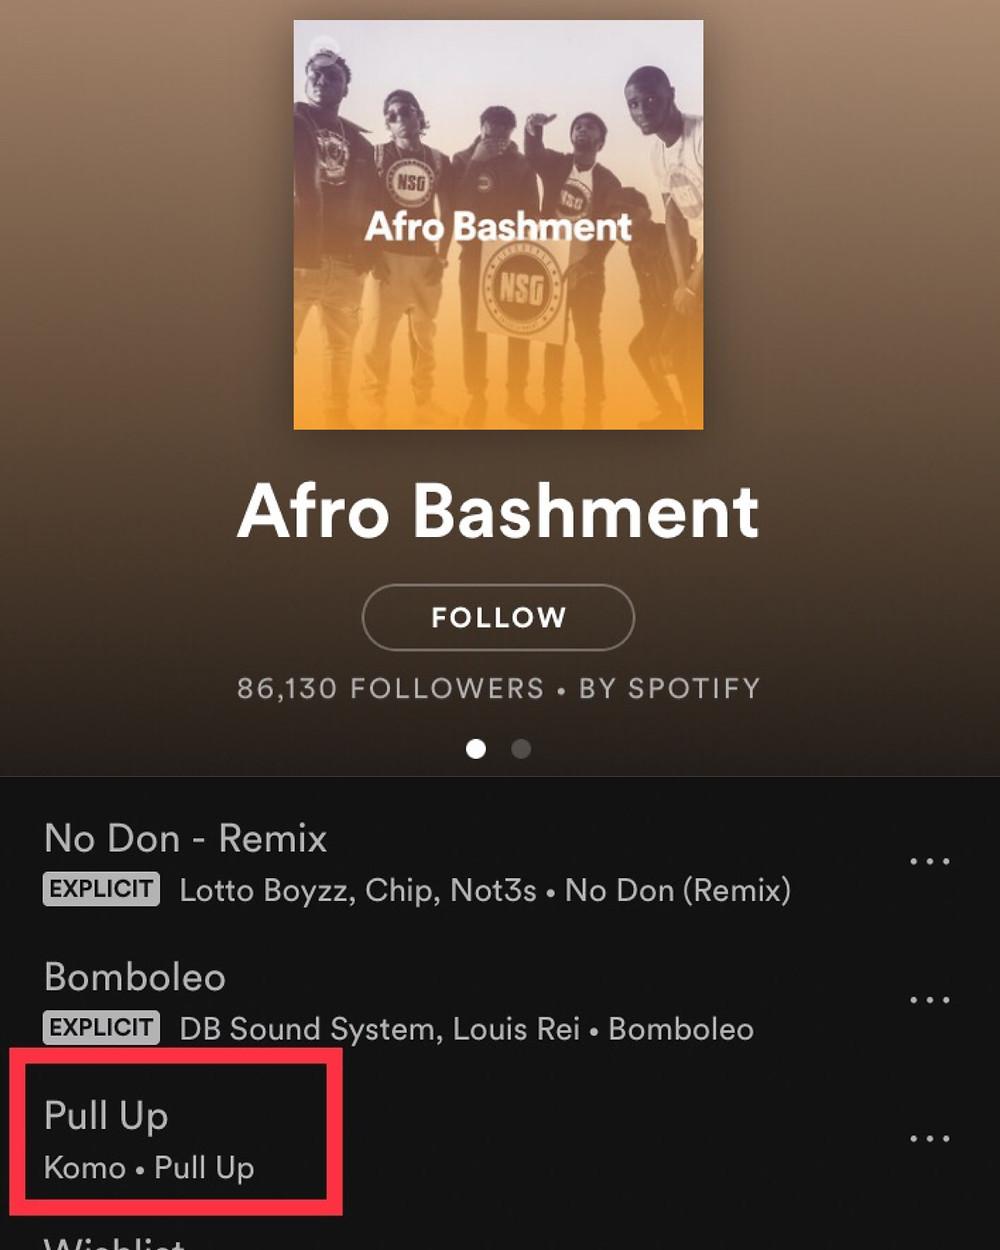 Spotify Afro Bashment (Featuring Komo)